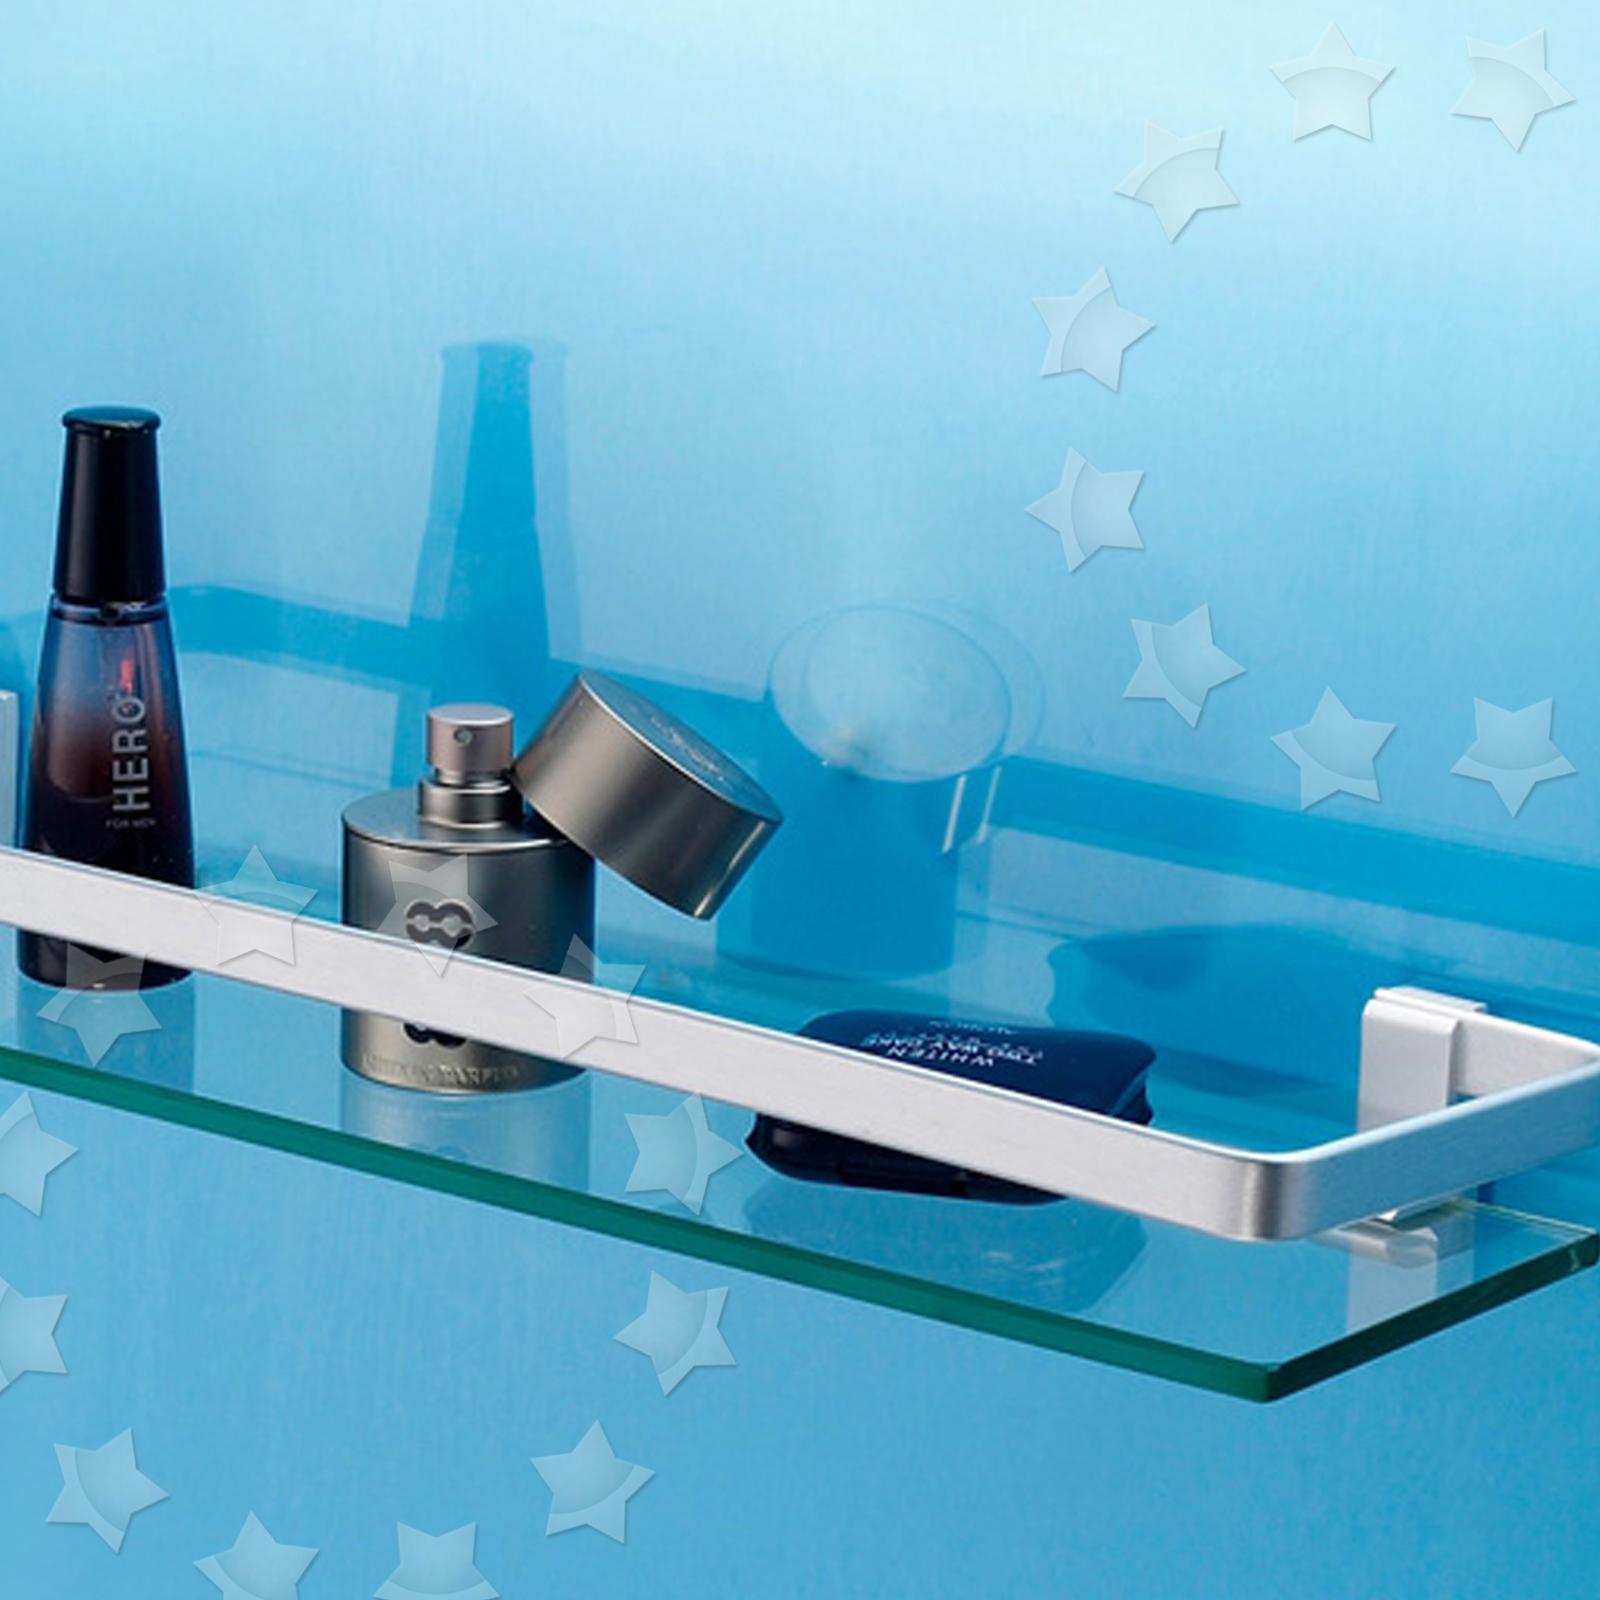 Chrome Shower Shelf Storage Caddy Wall Organizer Bathroom Rack ...